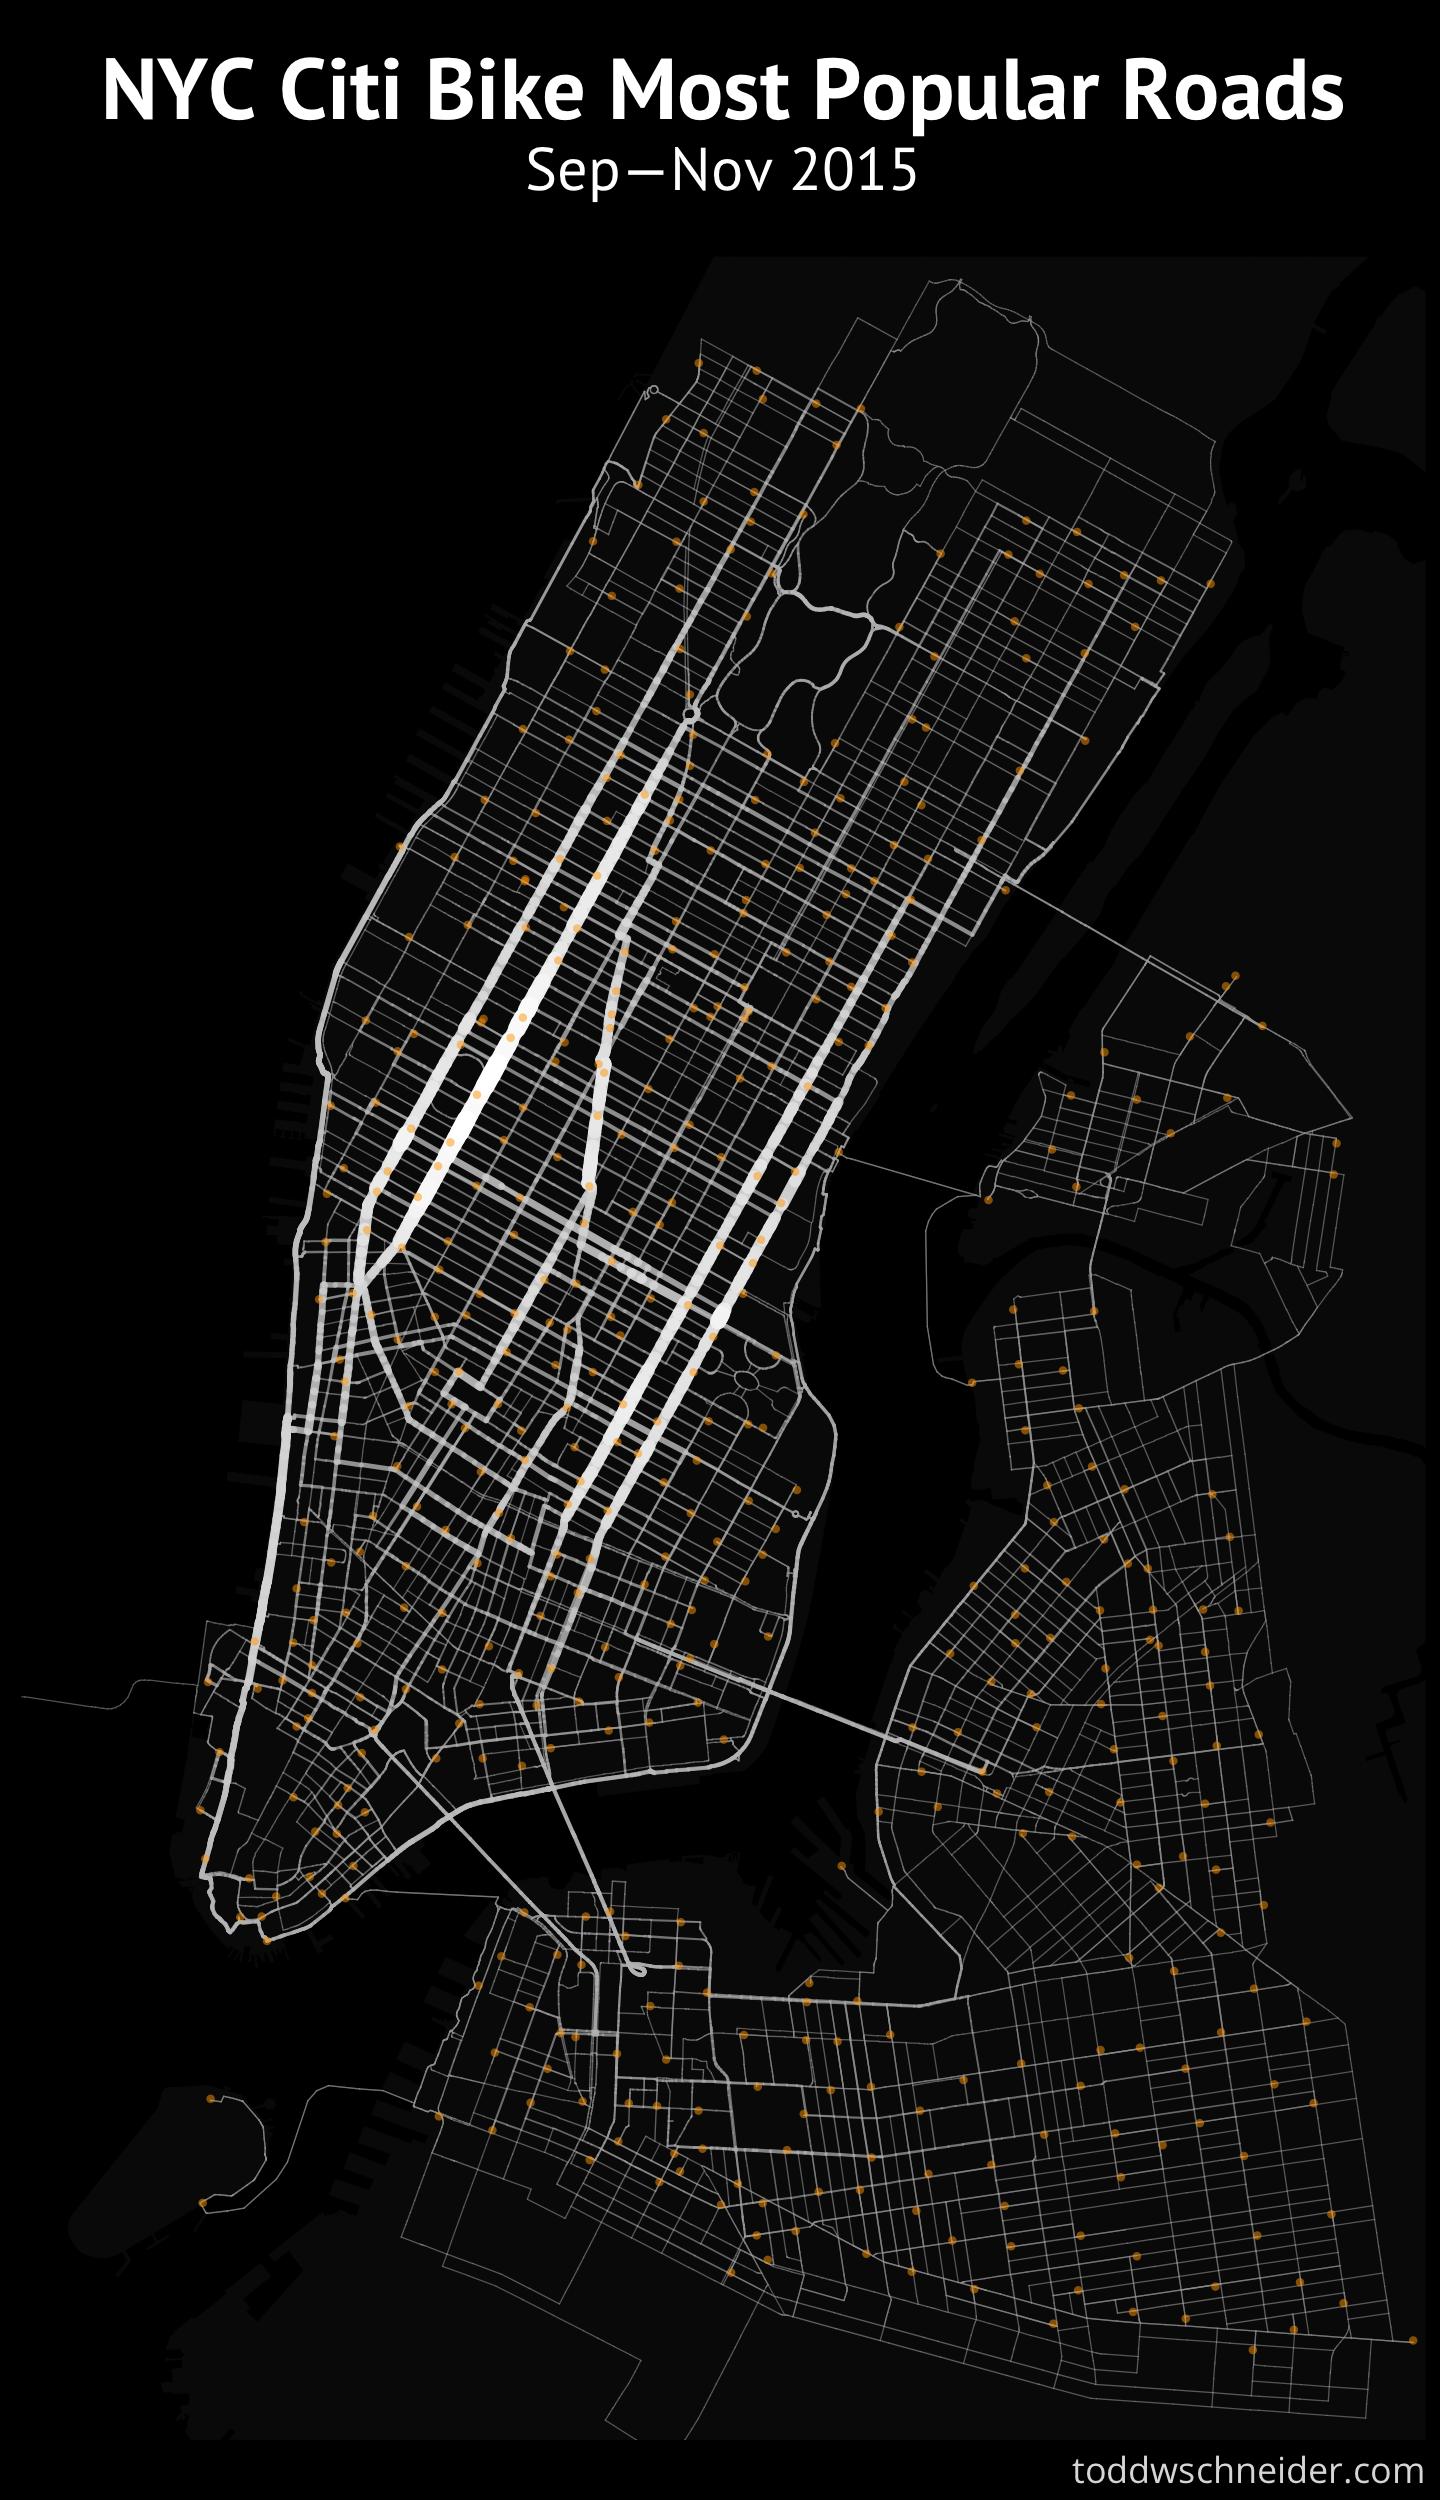 A Tale Of TwentyTwo Million Citi Bike Rides Analyzing The NYC - Nyc map bike lanes